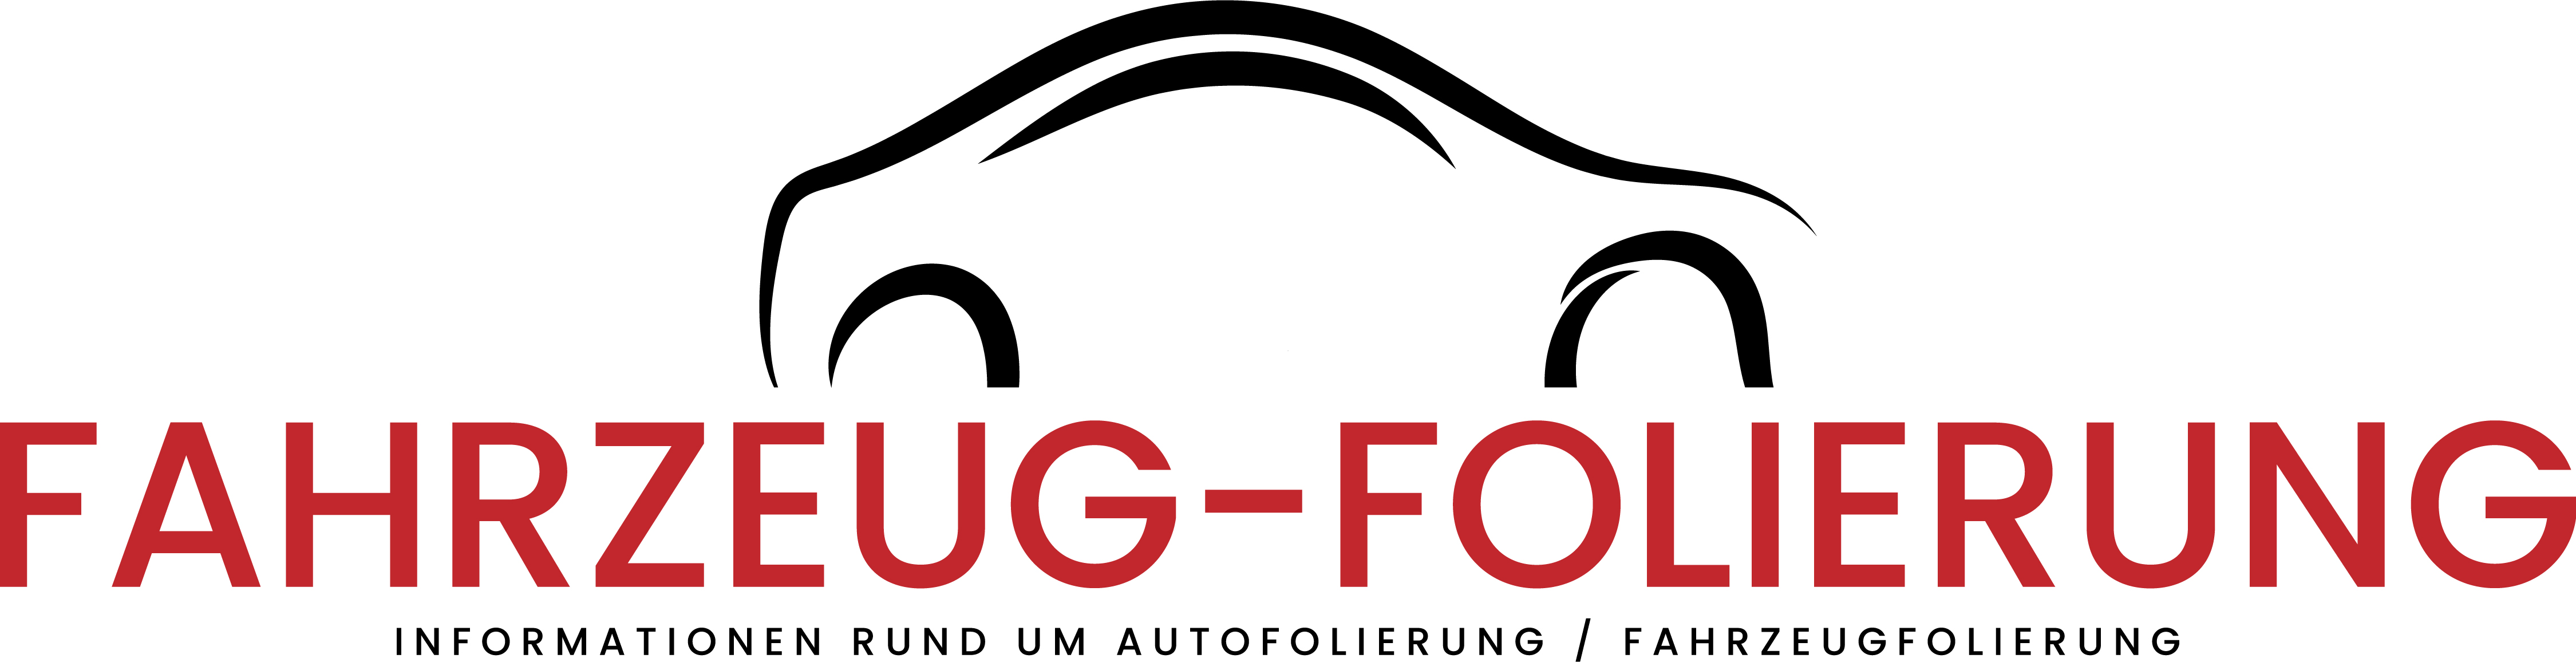 Fahrzeug-Folierung